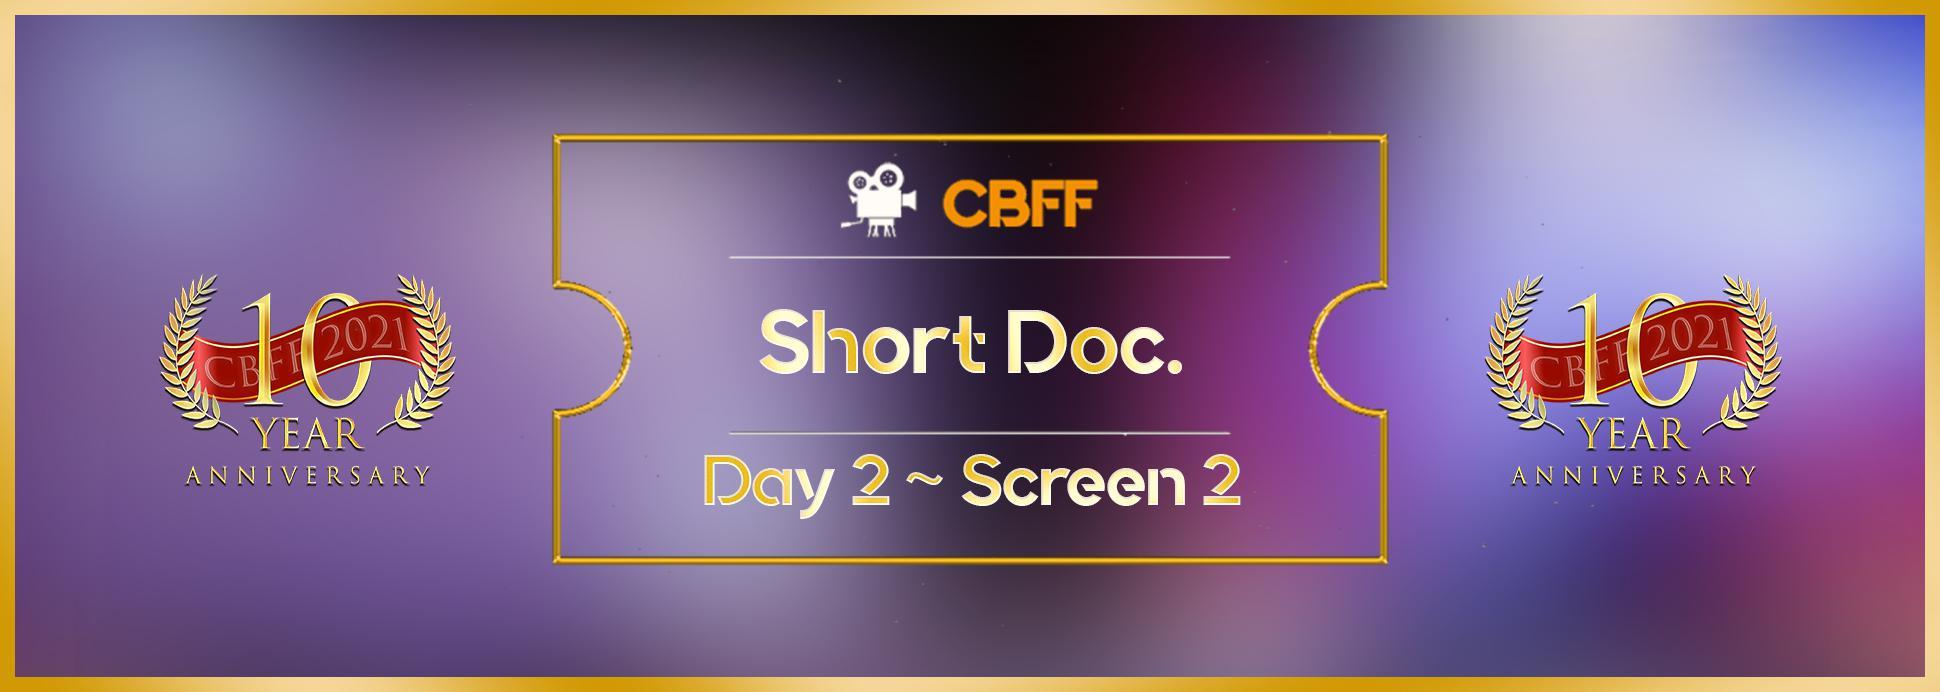 Day 2, Screen 2: Short Doc.